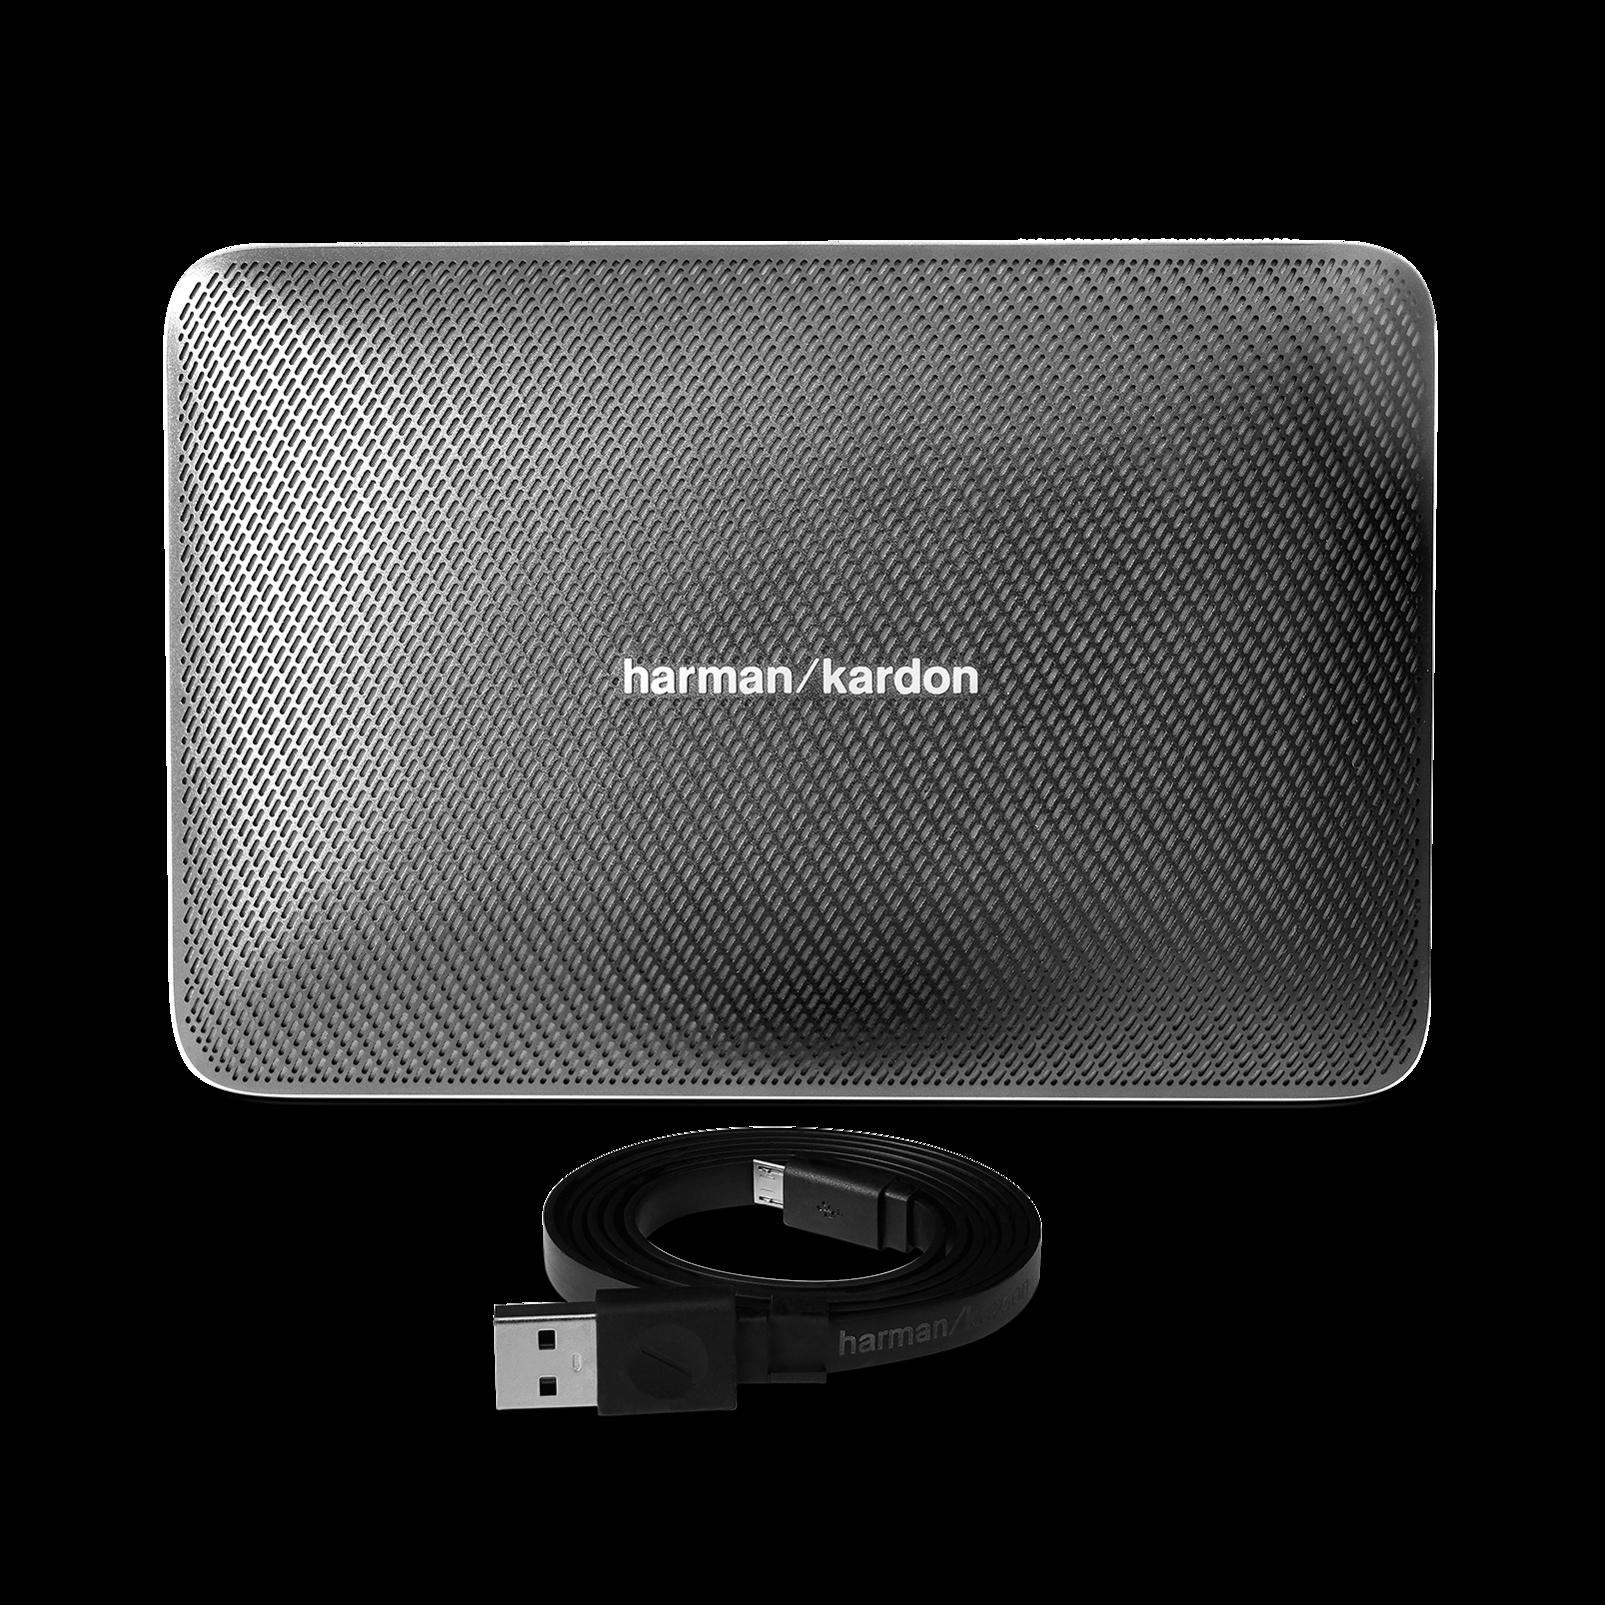 Esquire 2 - Grey - Premium portable Bluetooth speaker with quad microphone conferencing system - Detailshot 1